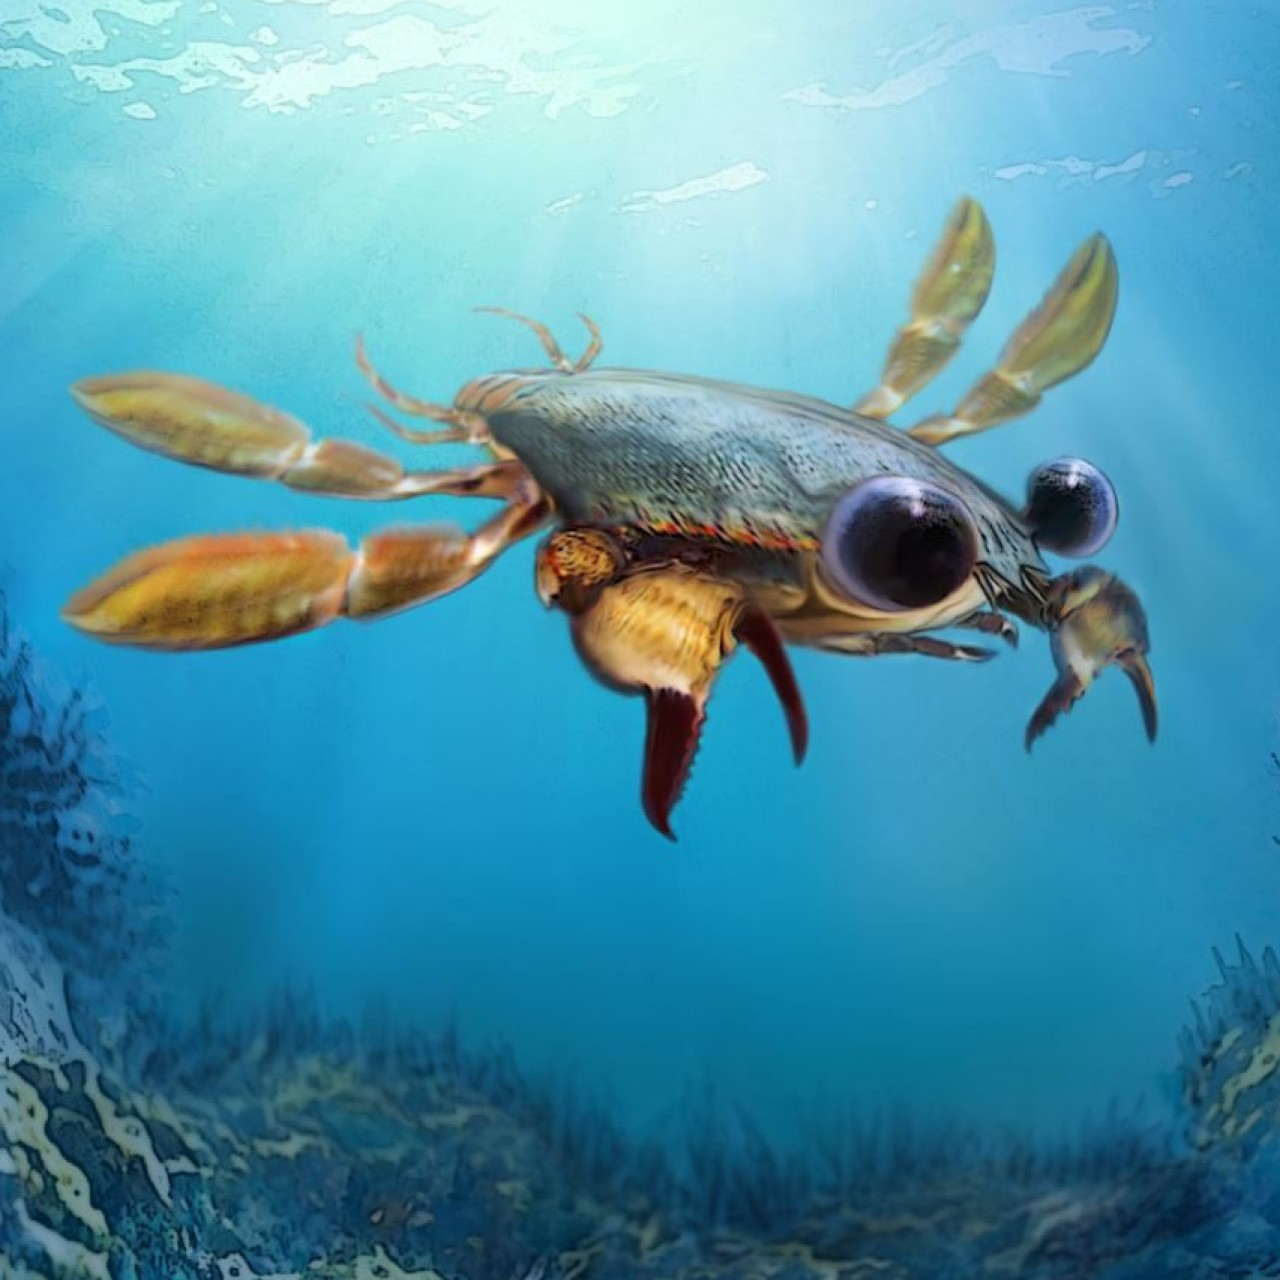 Nightmare crab with cartoon. Crabs clipart big eyed